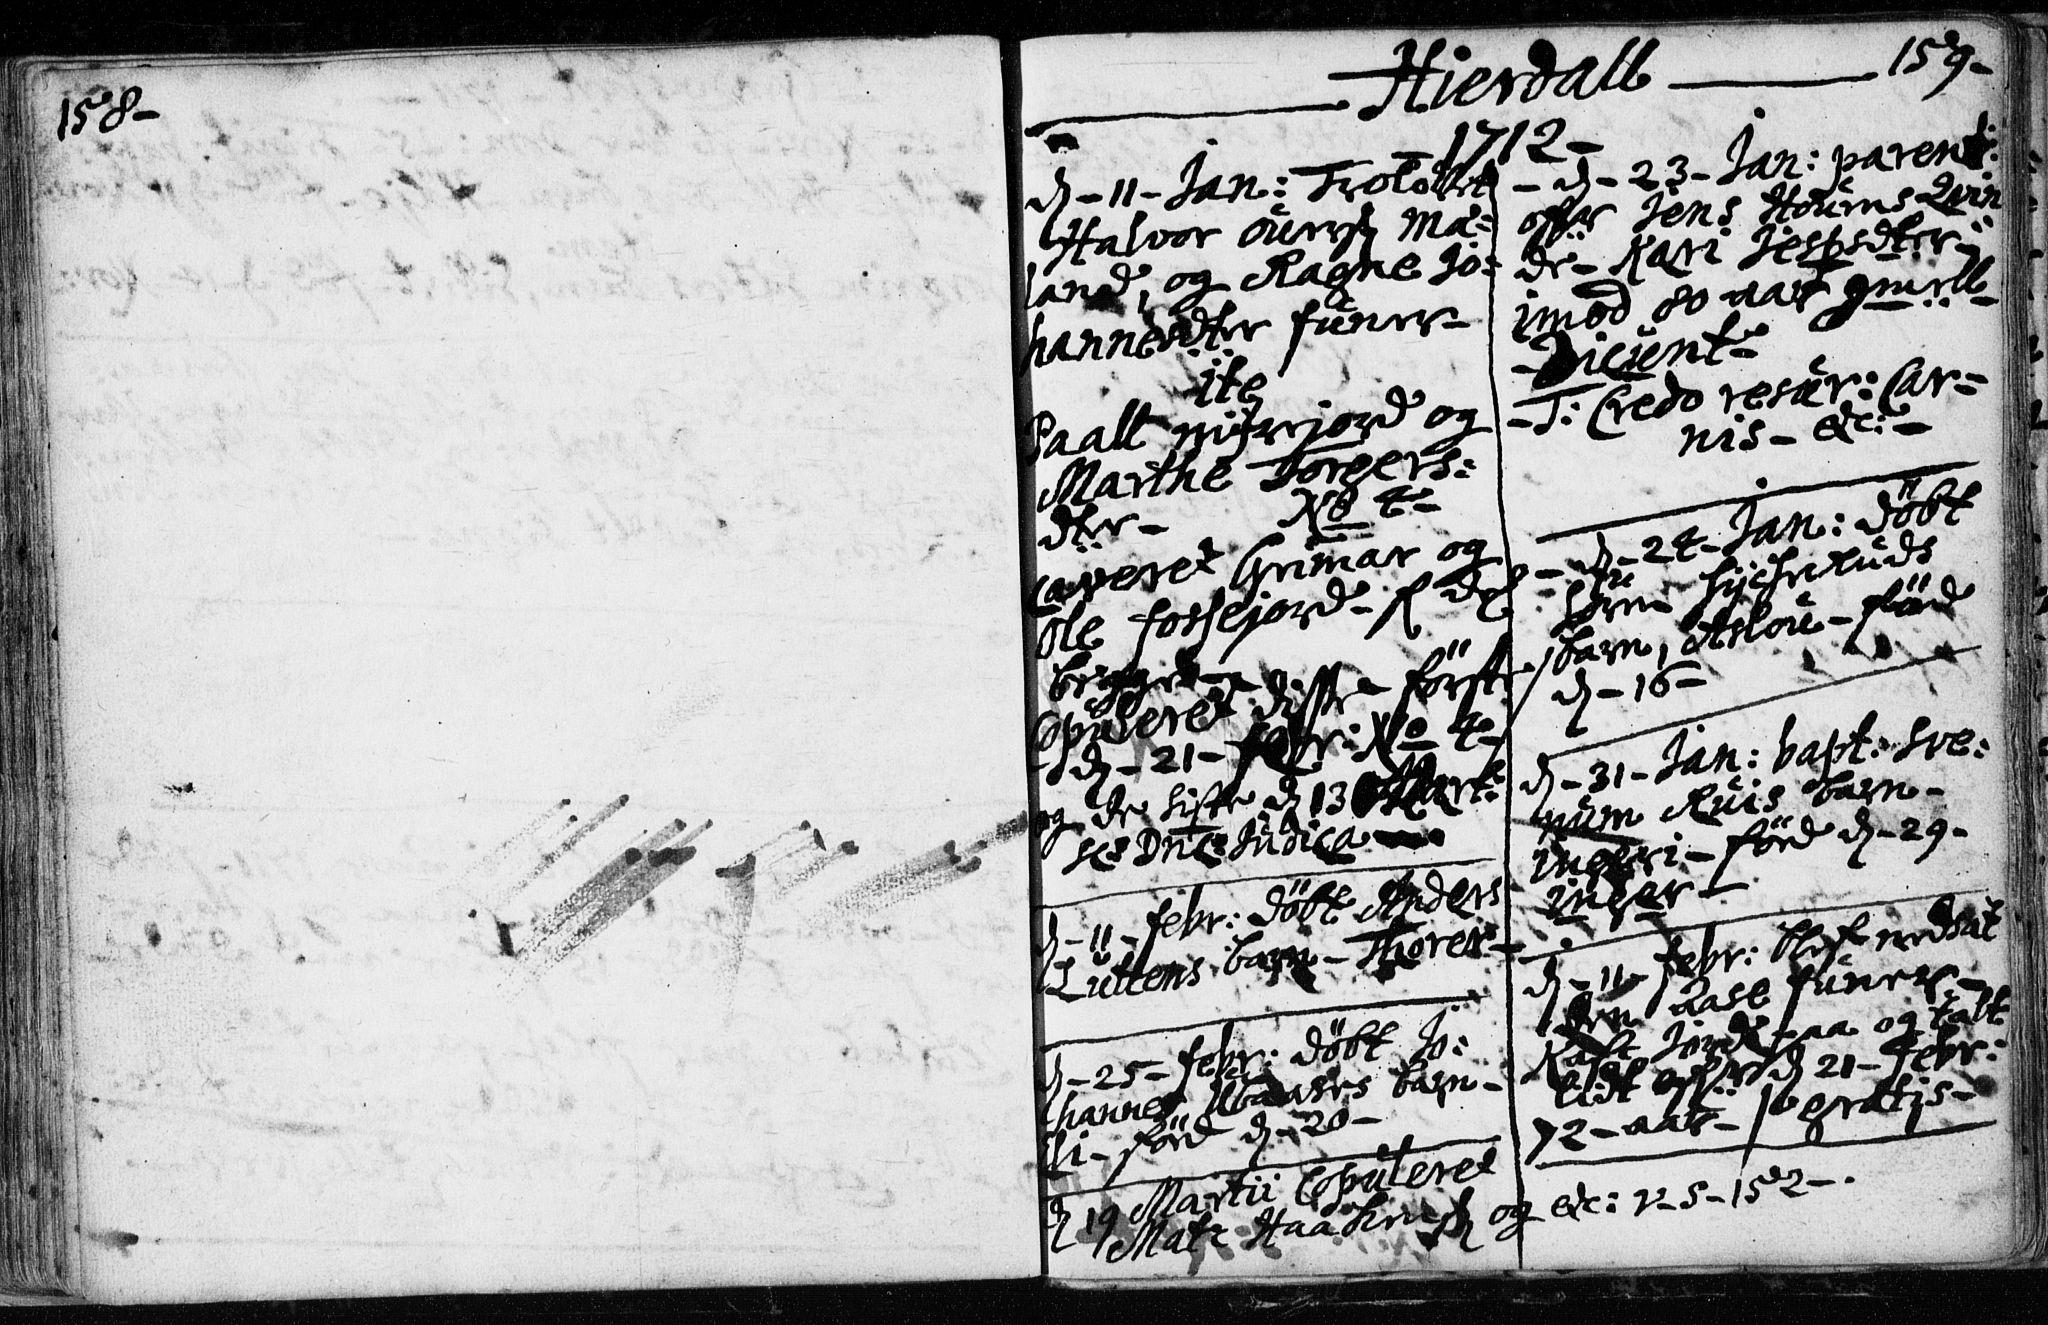 SAKO, Hjartdal kirkebøker, F/Fa/L0001: Ministerialbok nr. I 1, 1685-1714, s. 158-159